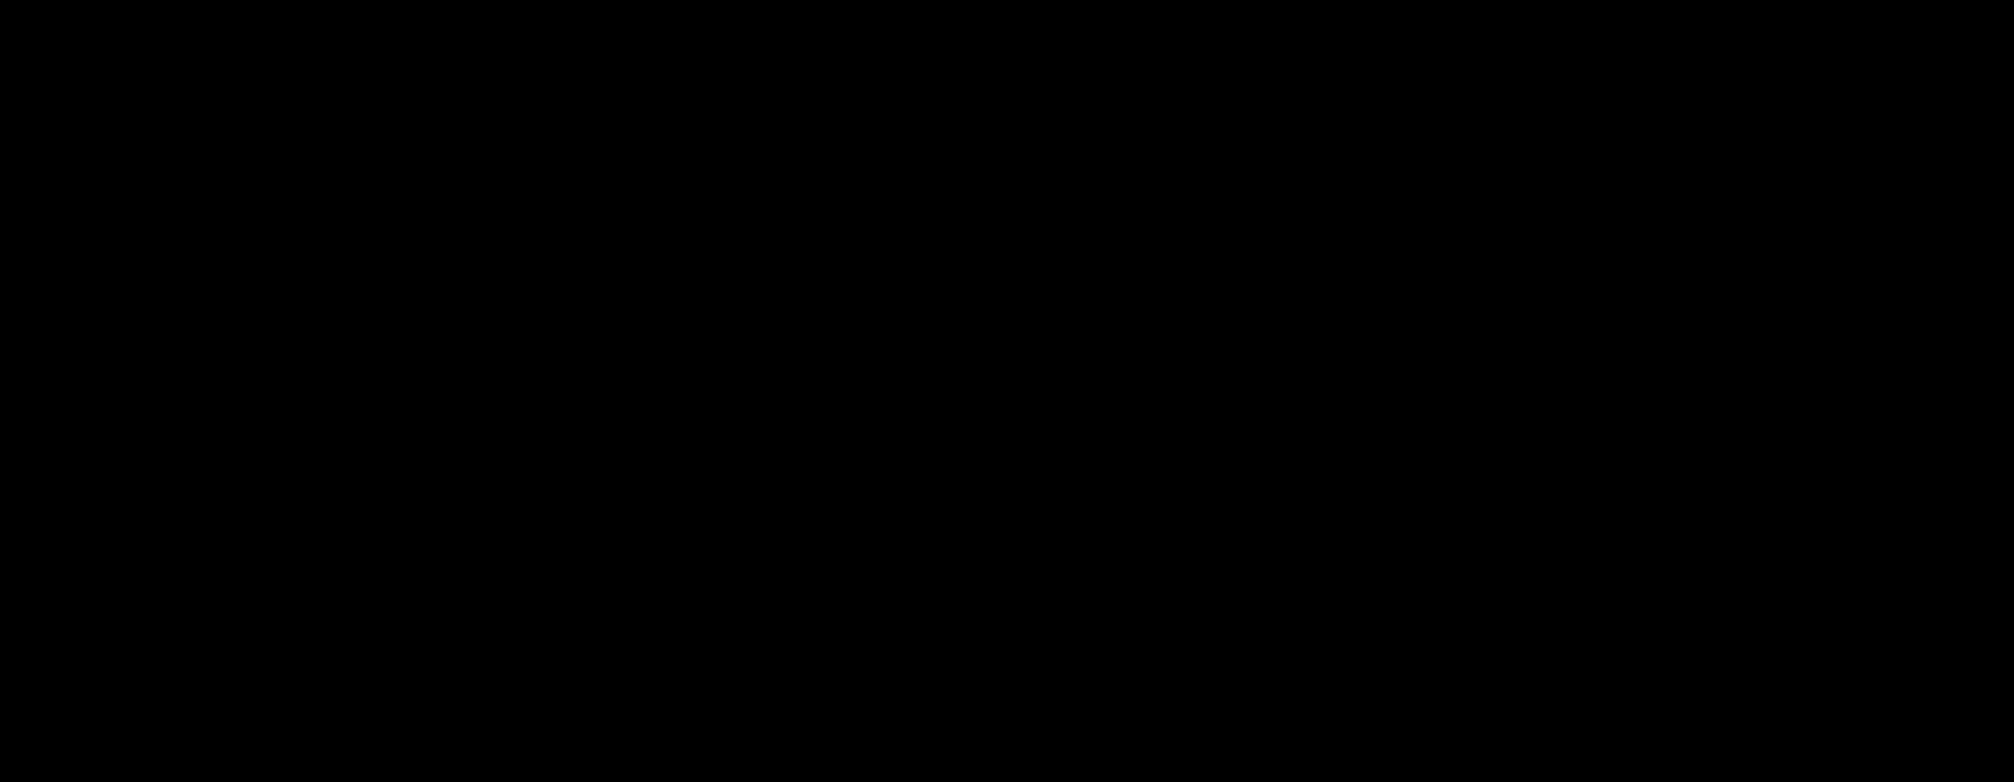 5-(Biotinamido)pentylazide